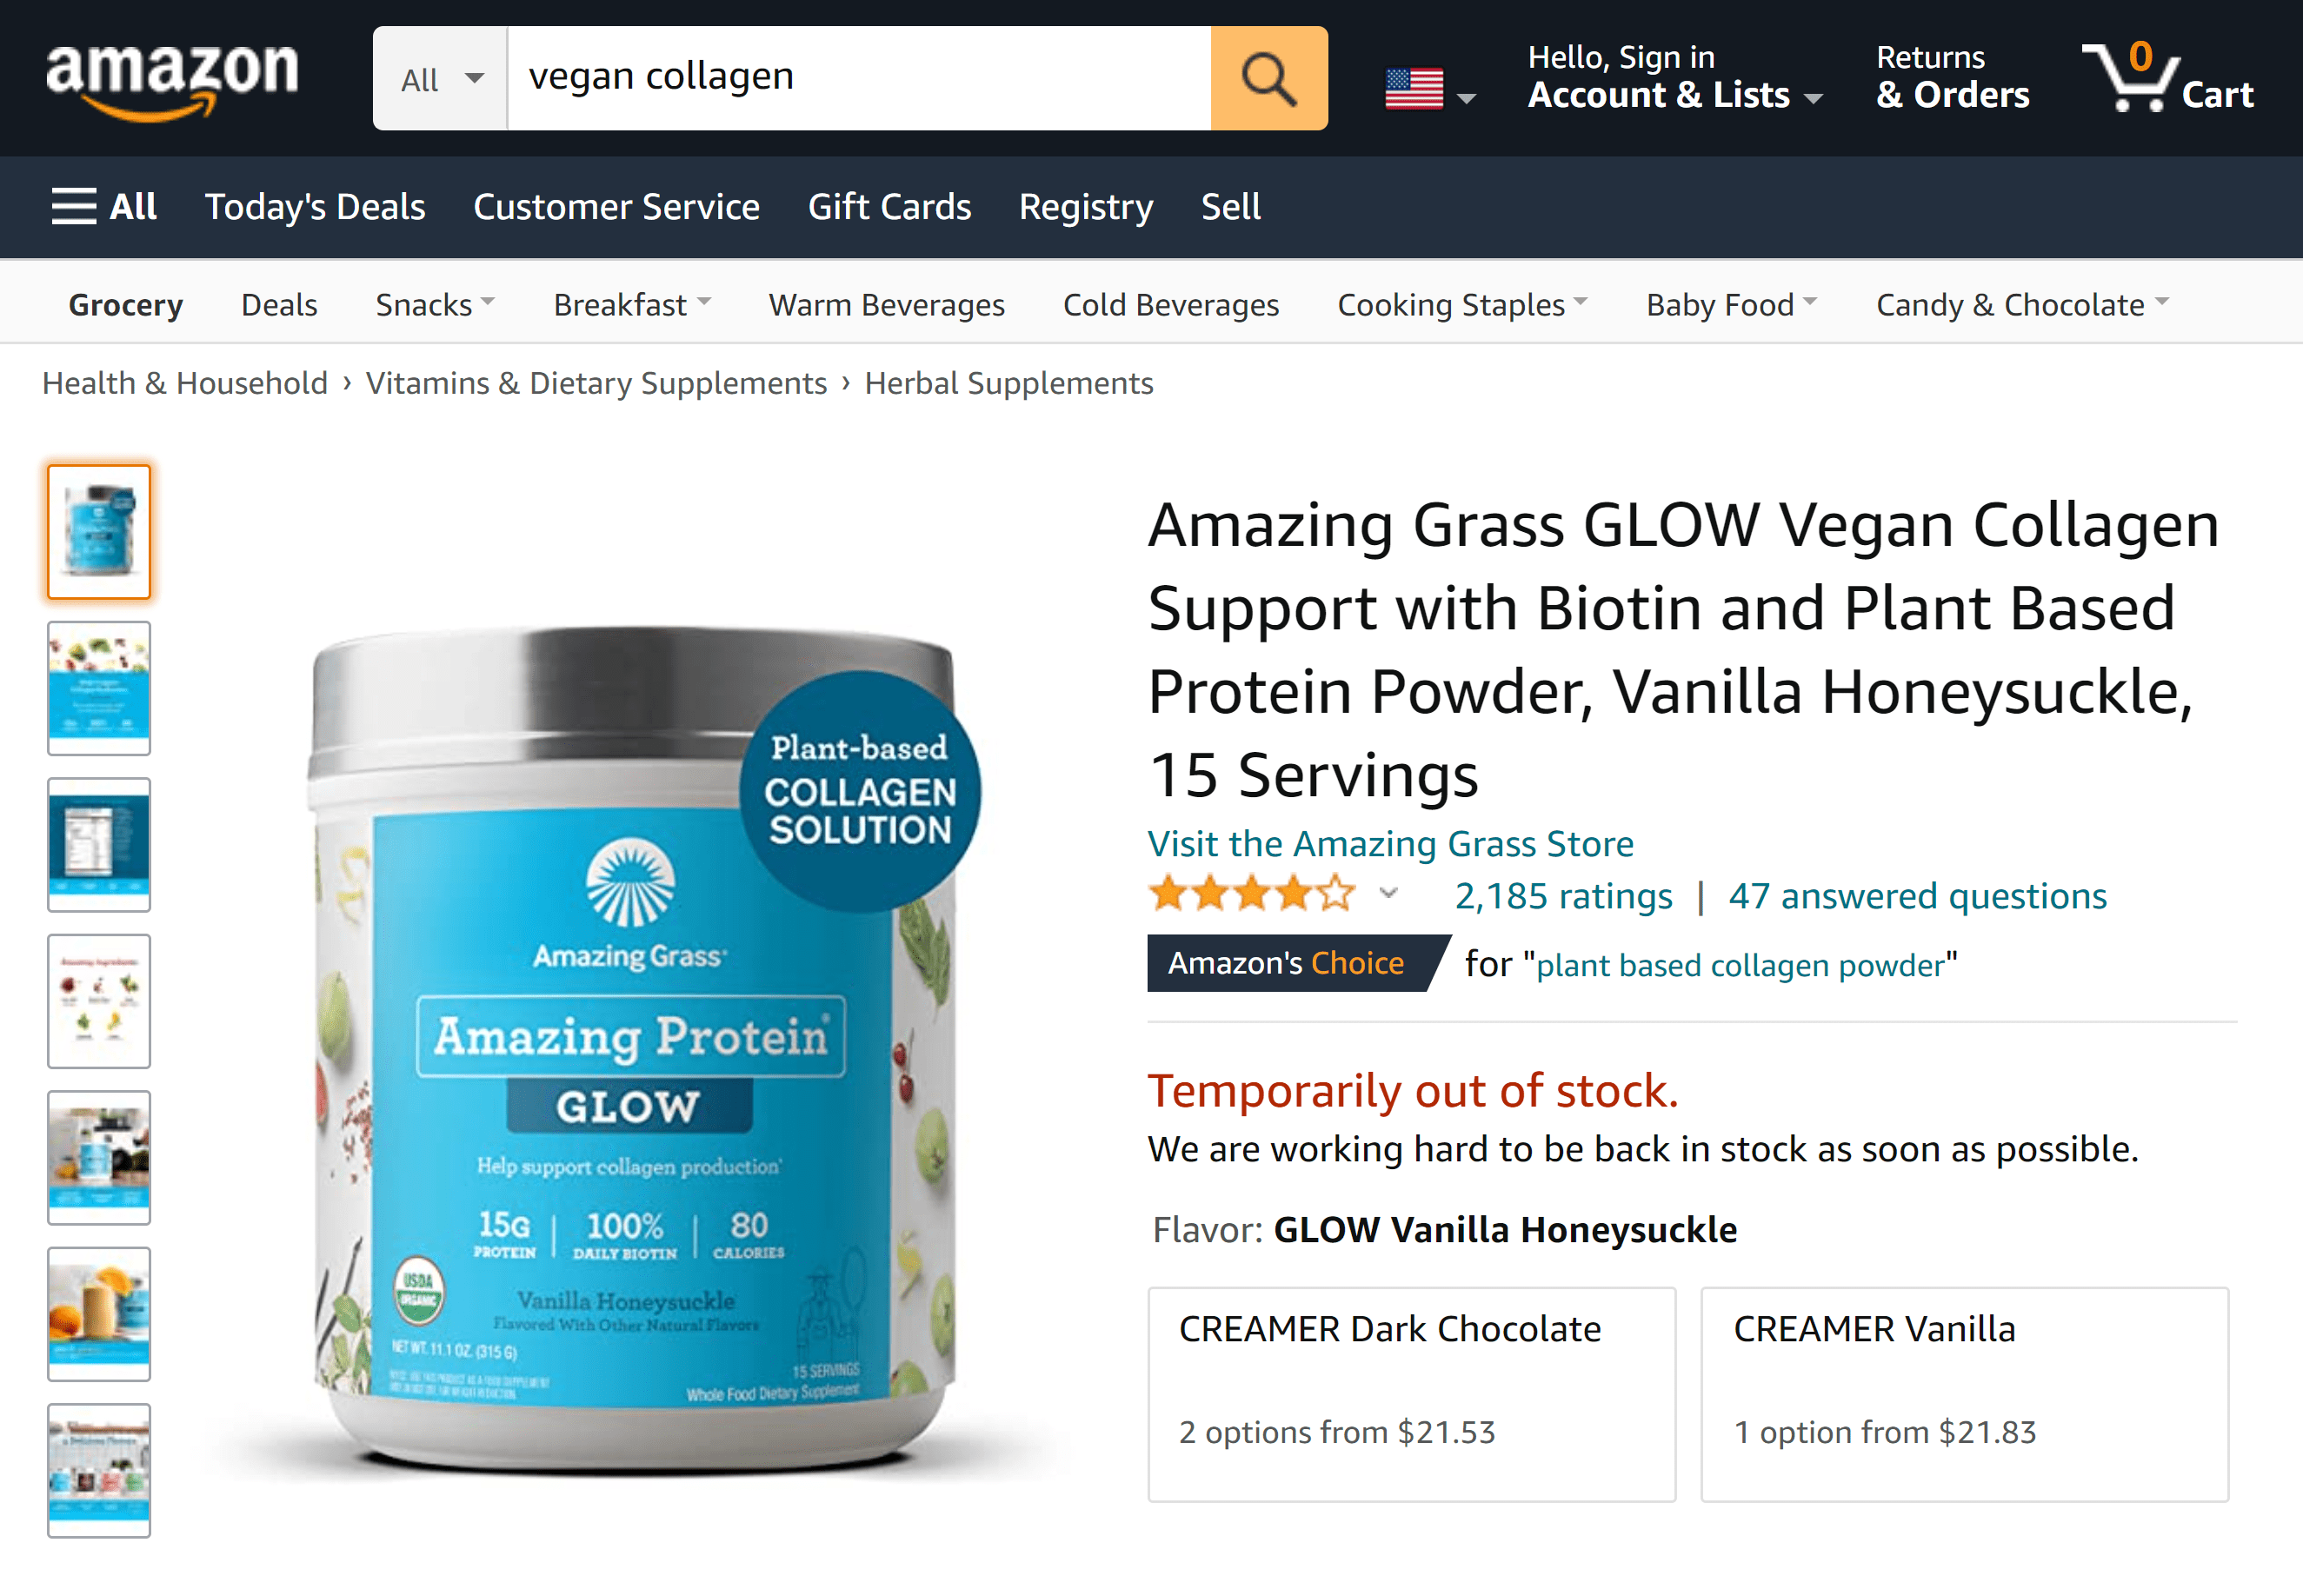 amazon-vegan-collagen-product-min.png